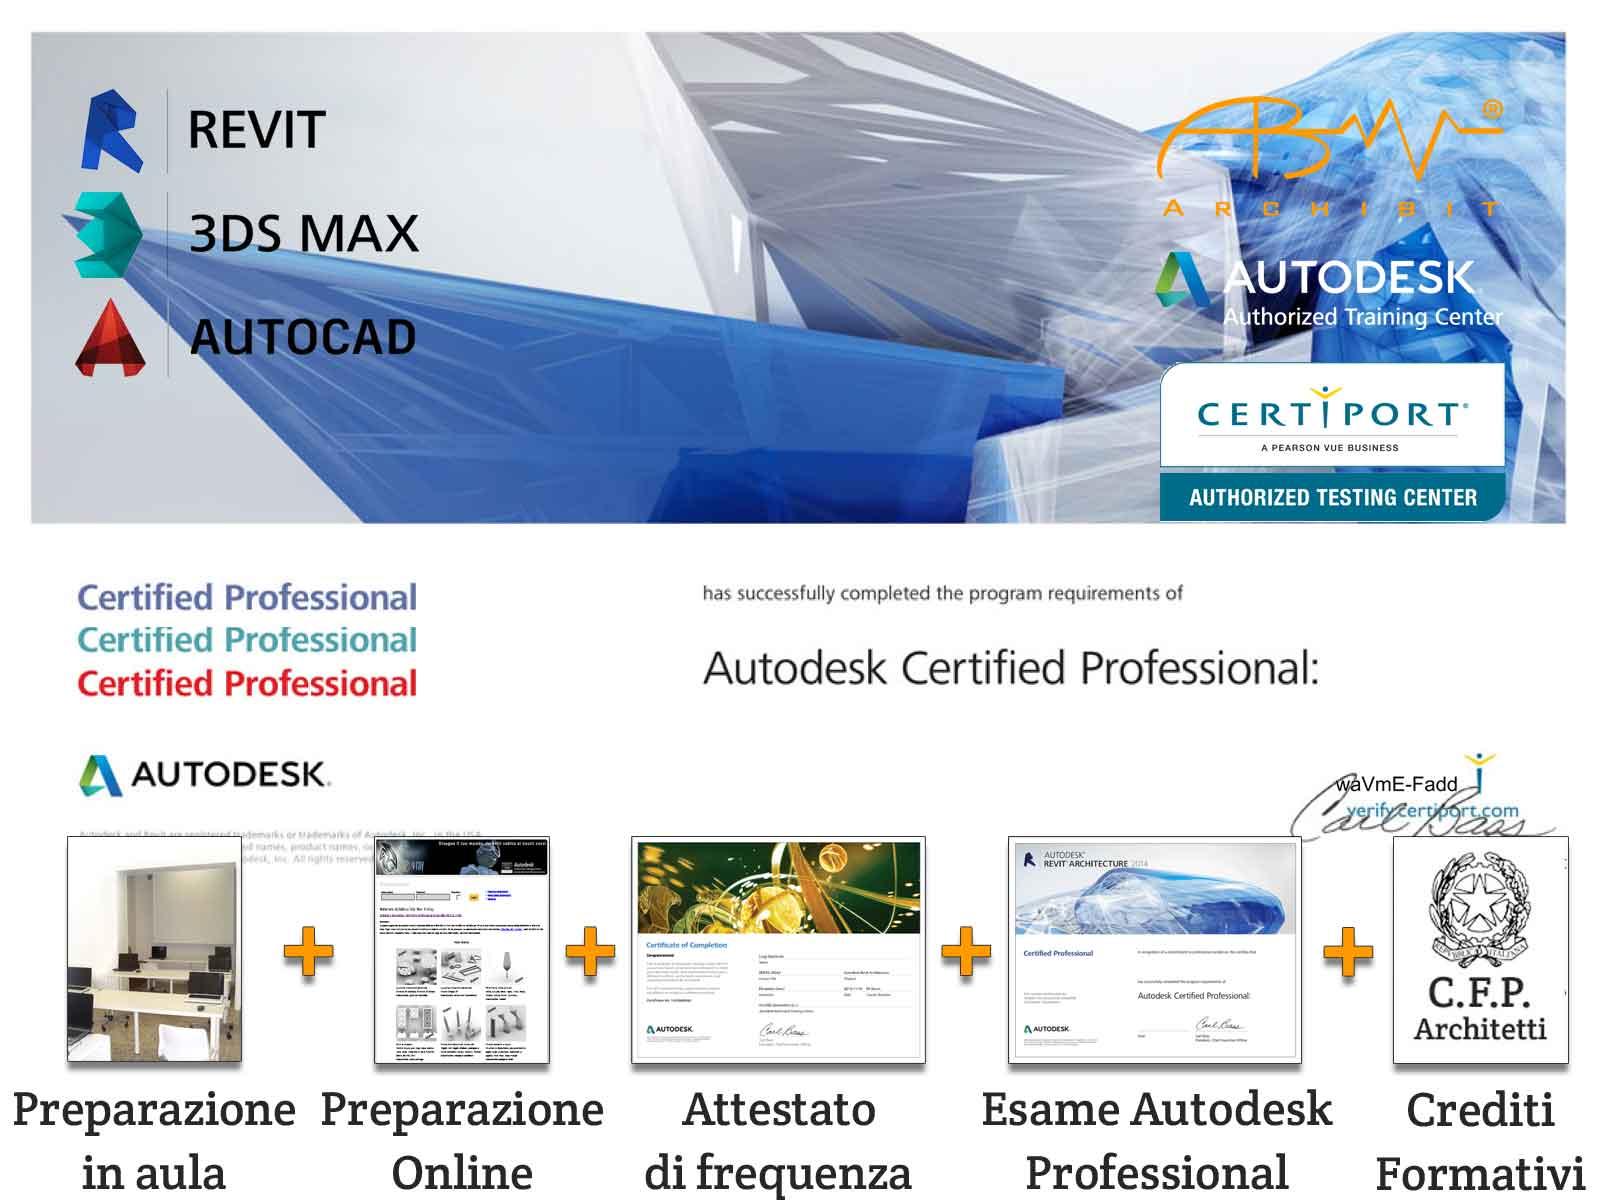 Certificazioni Professional Autodesk Esami Certiport 3ds max autocad revit mep structure archibit centro corsi grafica 3d autodesk a roma